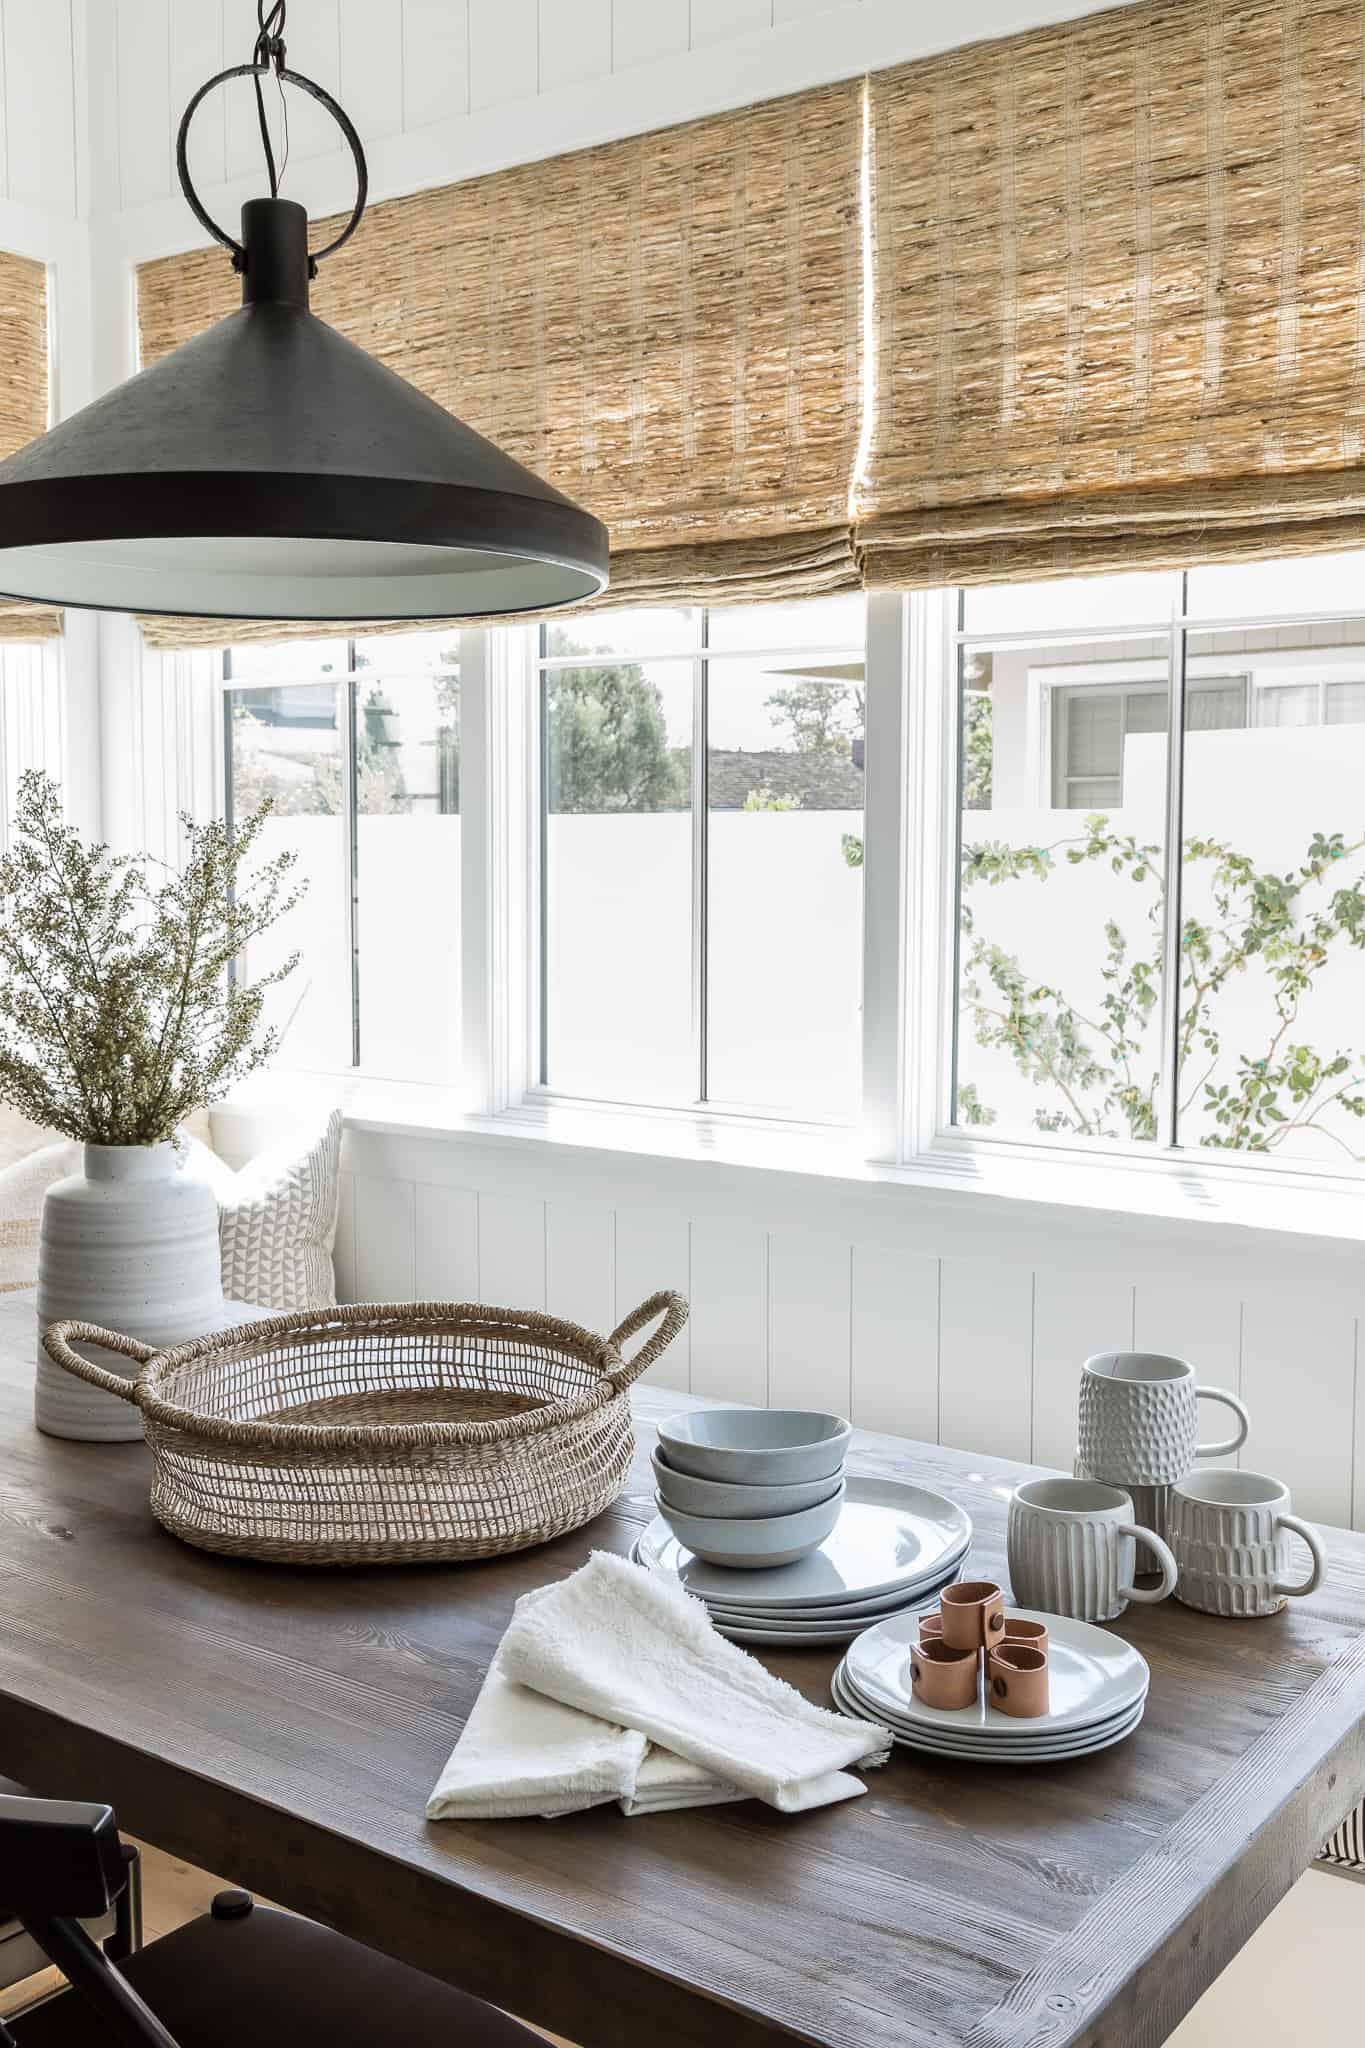 Windward Breakfast Nook Design - Mindy Gayer Design Co.